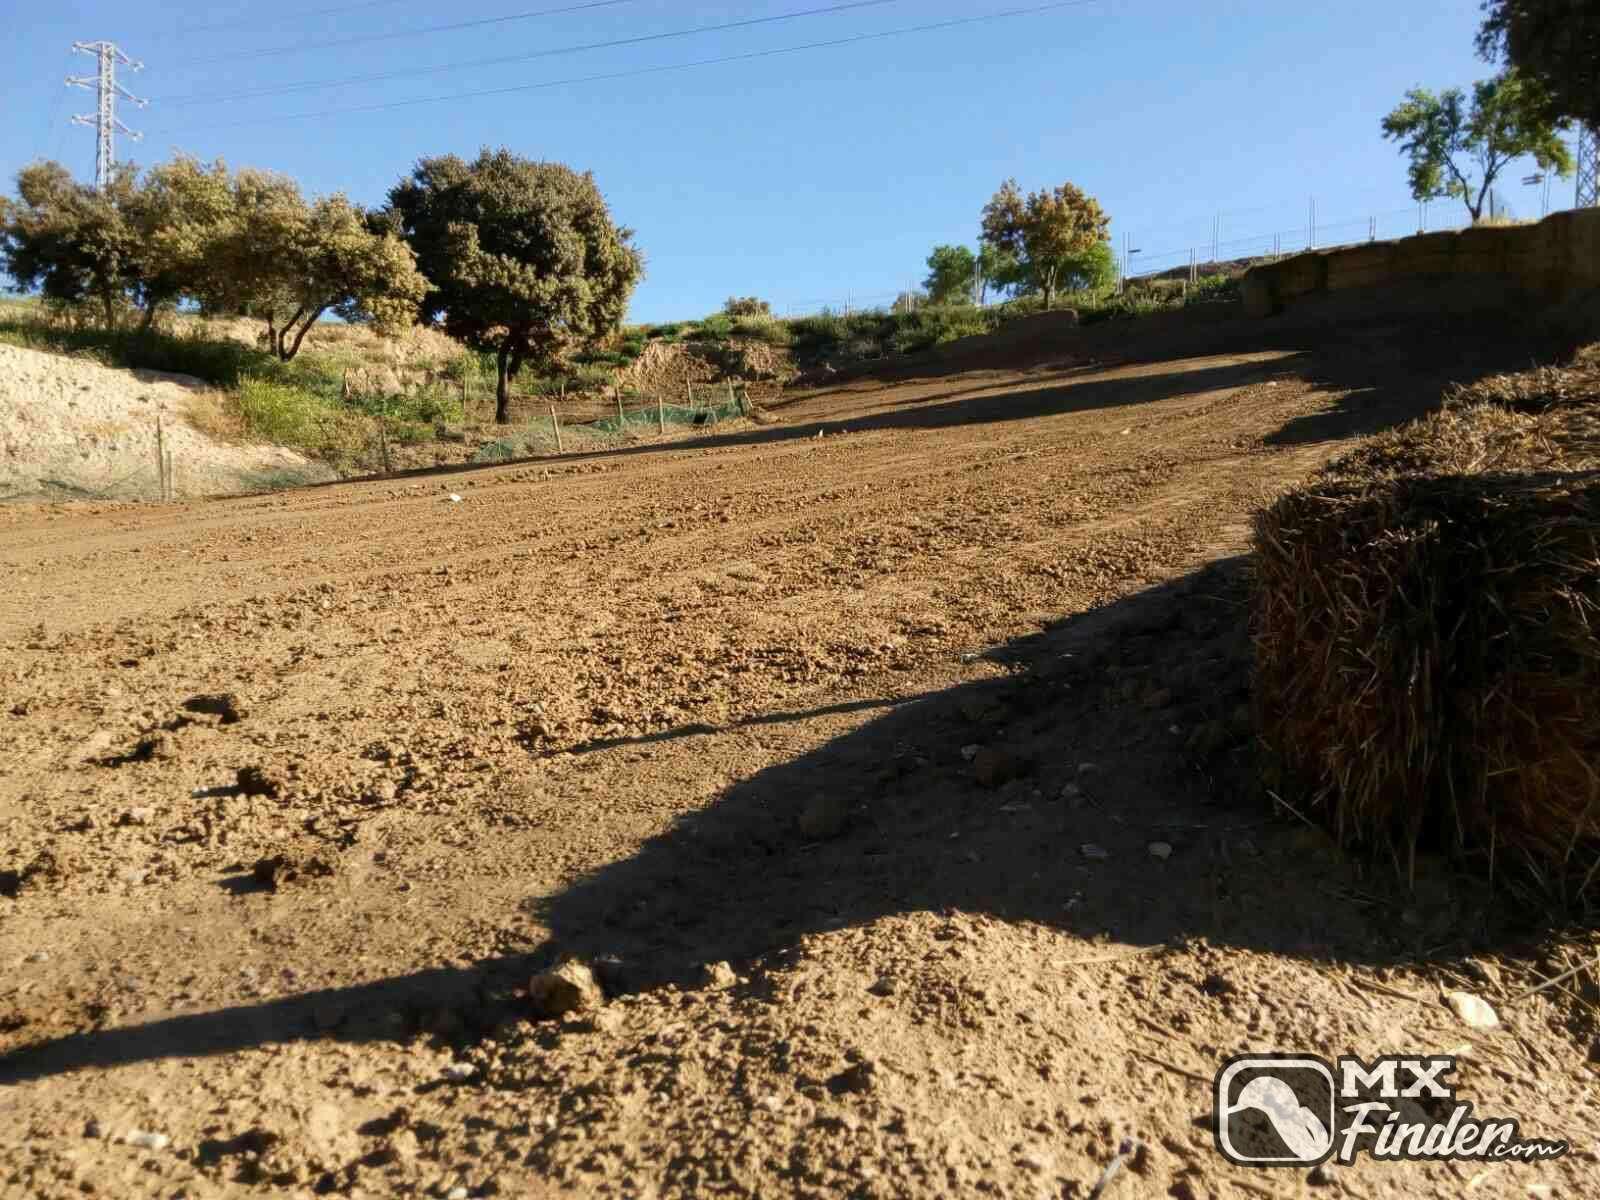 motocross, El Bosquet, Ponts, motocross track